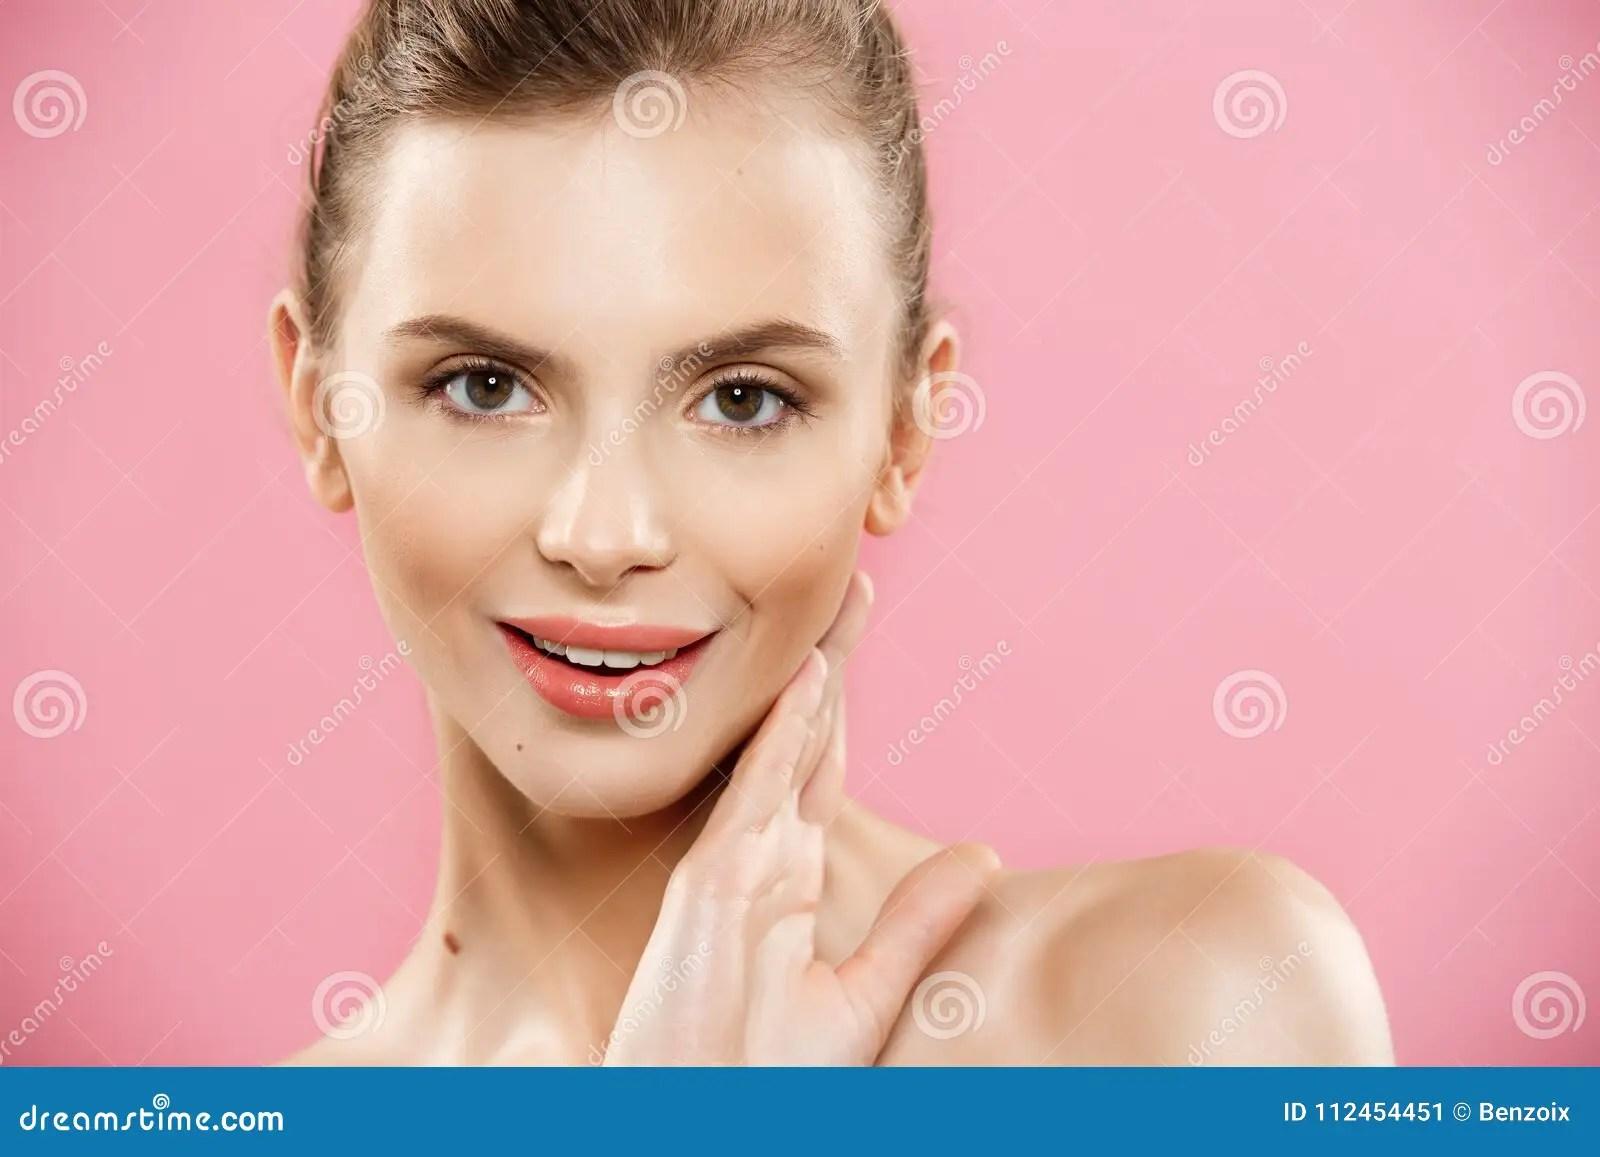 Fresh Skin Care Studio